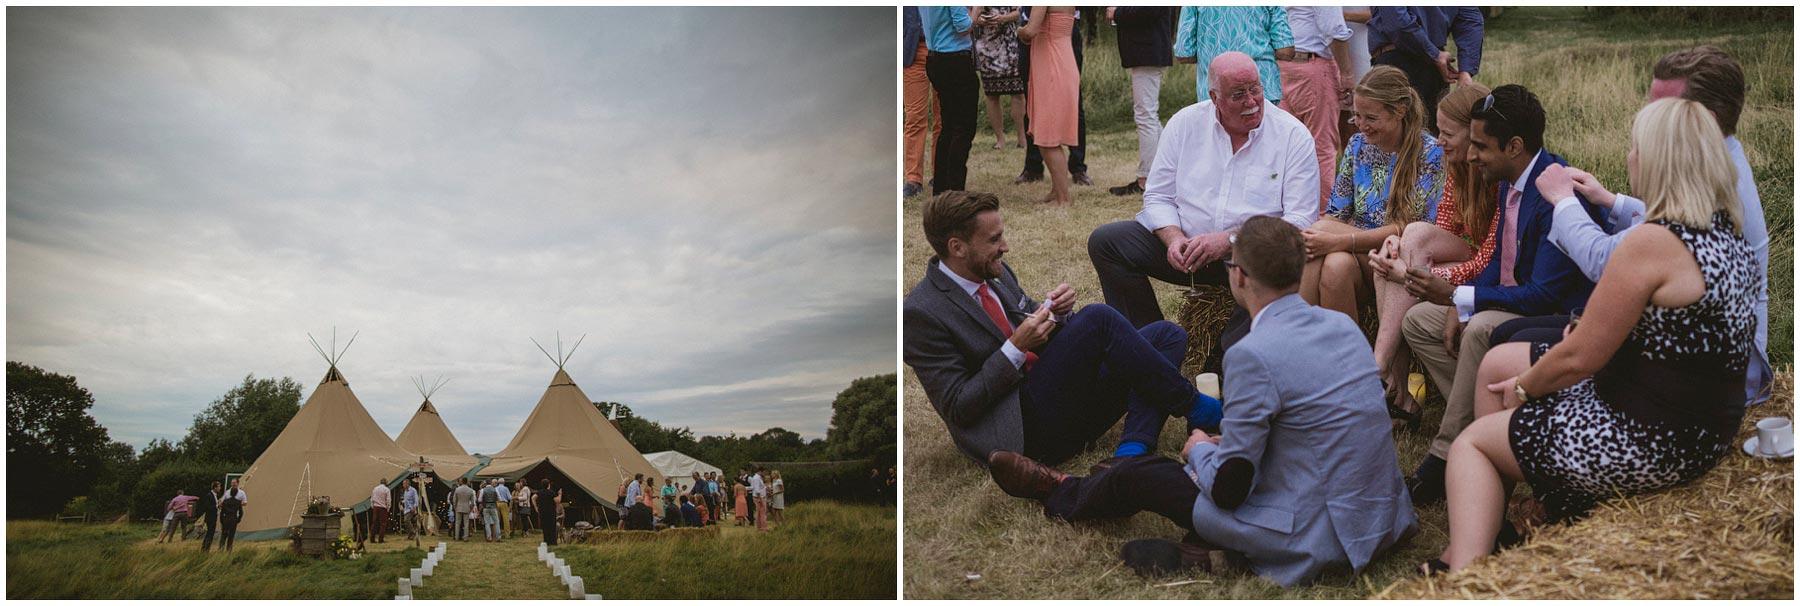 Kent-Festival-Tipi-wedding-photography_0176